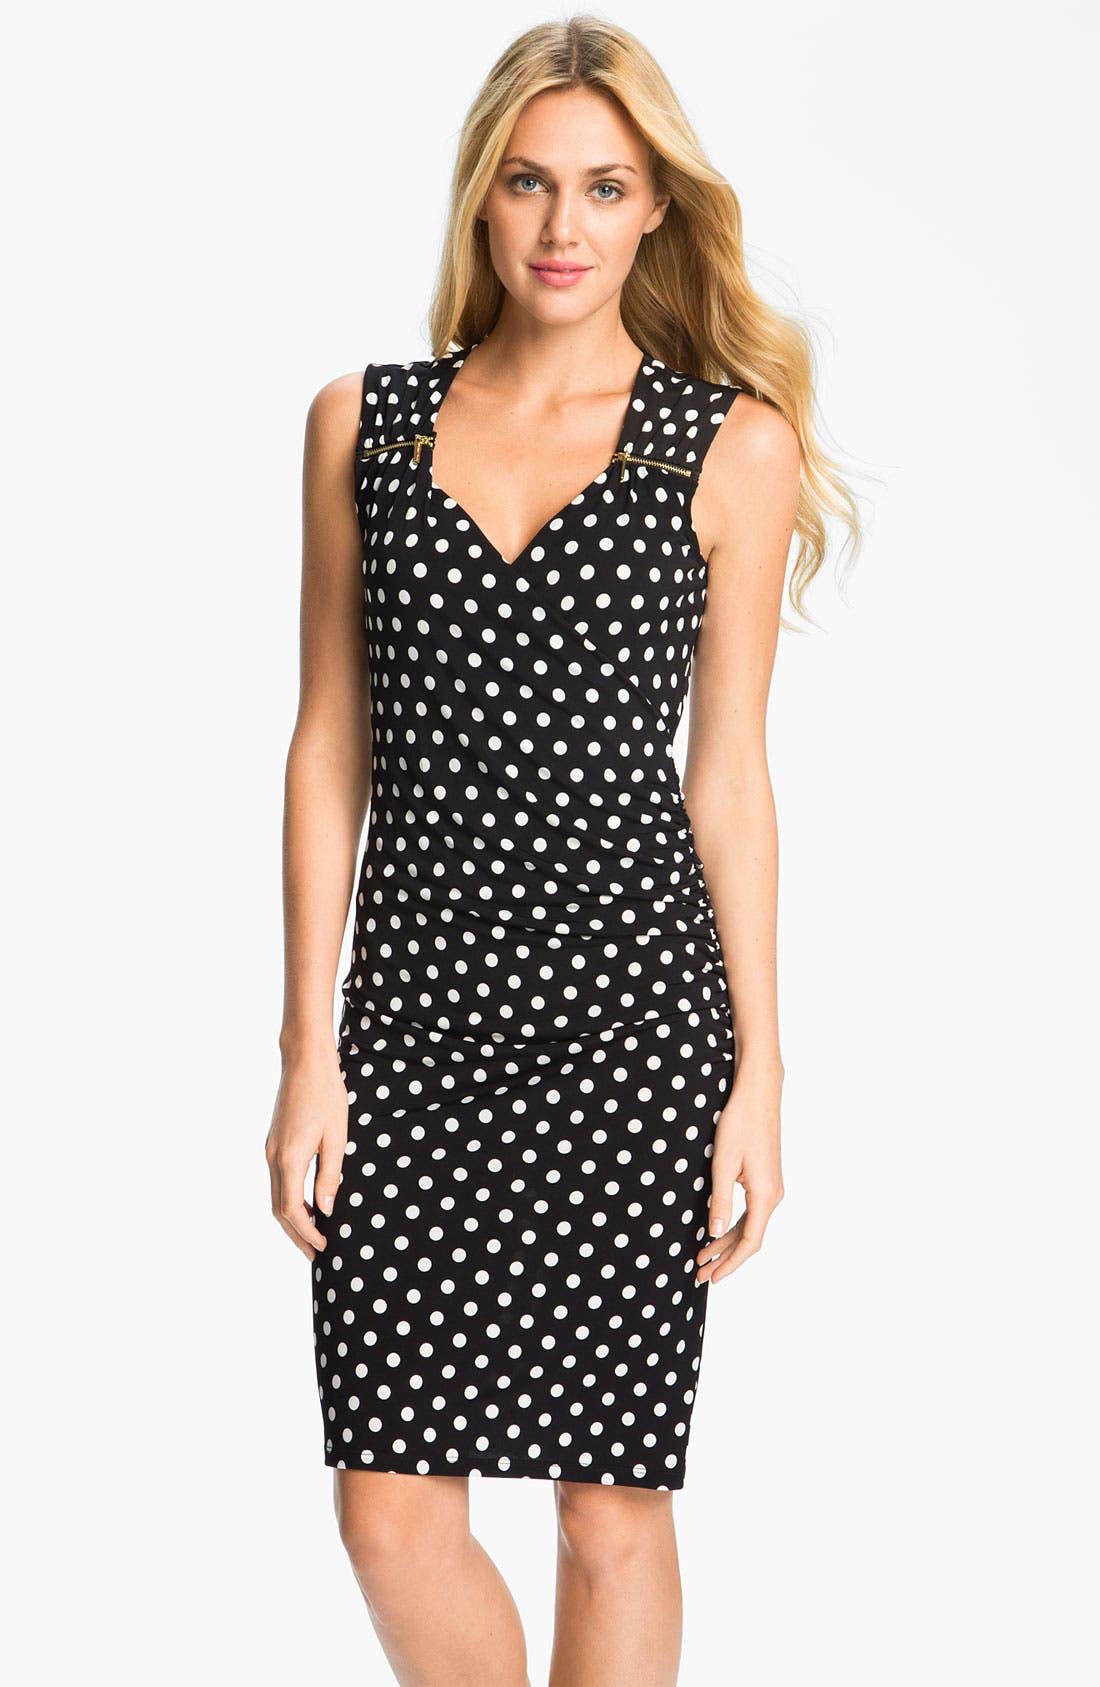 Alternate Image 1 Selected - MICHAEL Michael Kors Sweetheart Neck Dot Dress (Petite)